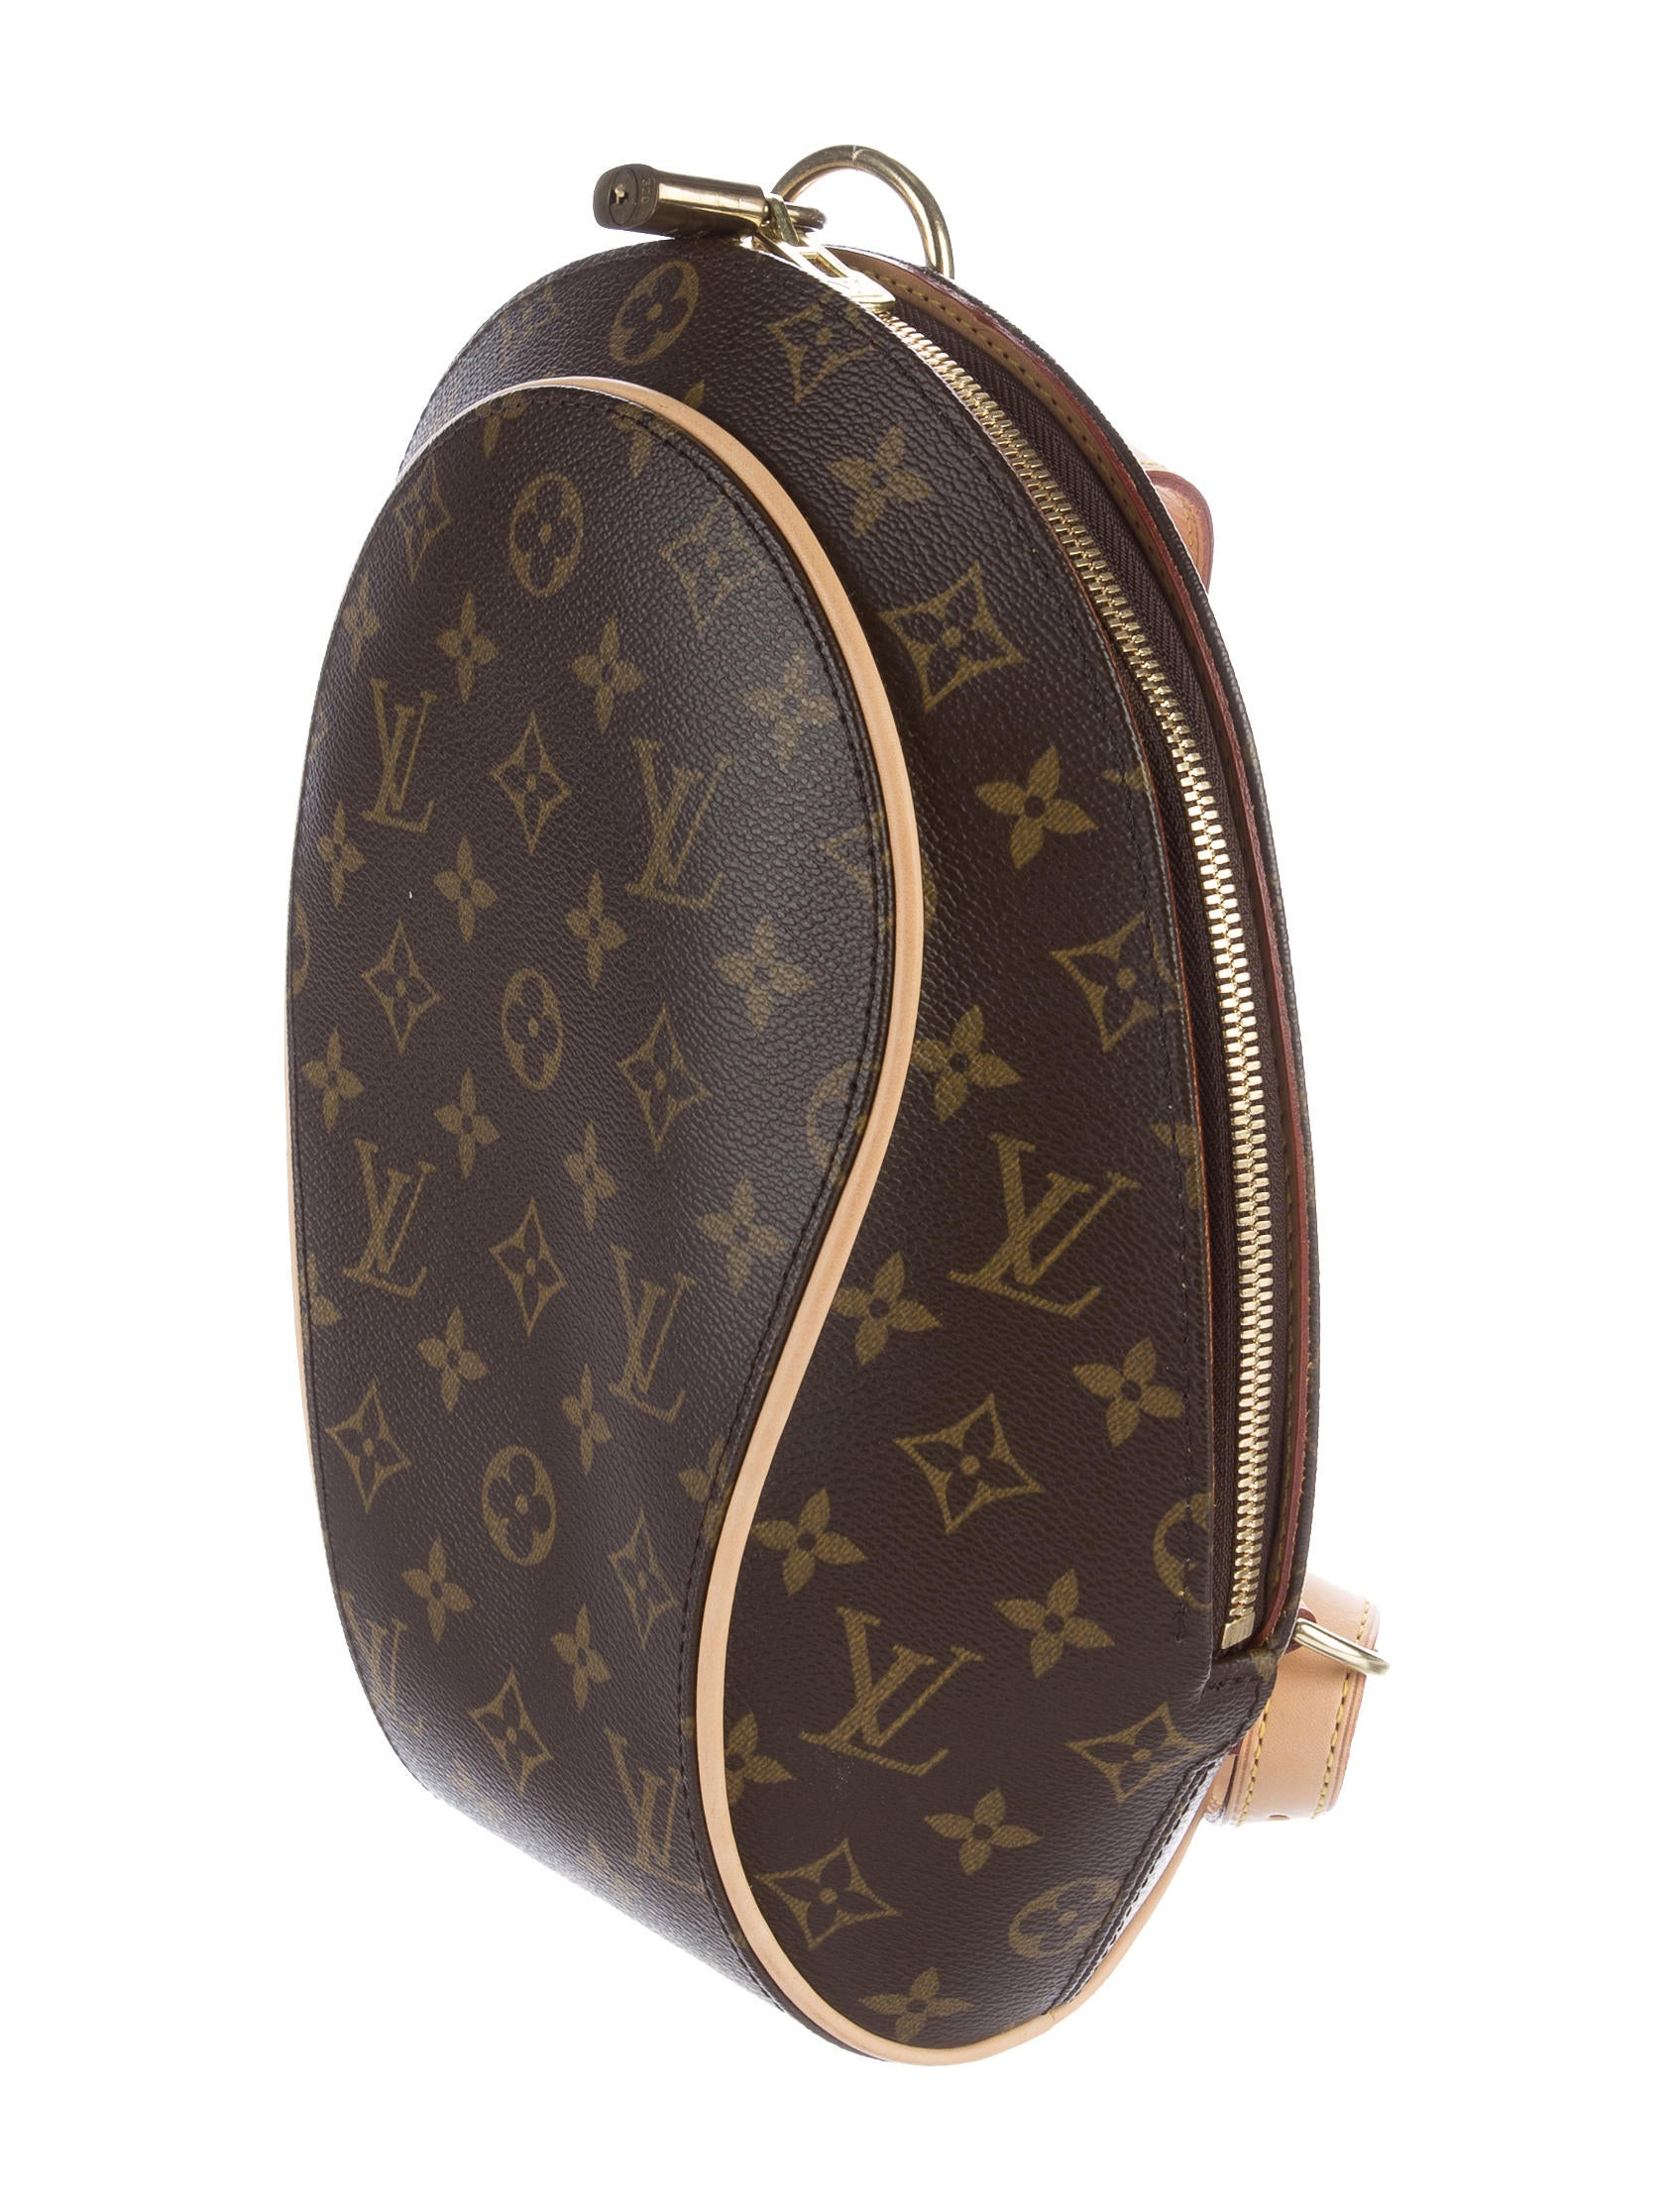 louis vuitton monogram ellipse backpack handbags. Black Bedroom Furniture Sets. Home Design Ideas